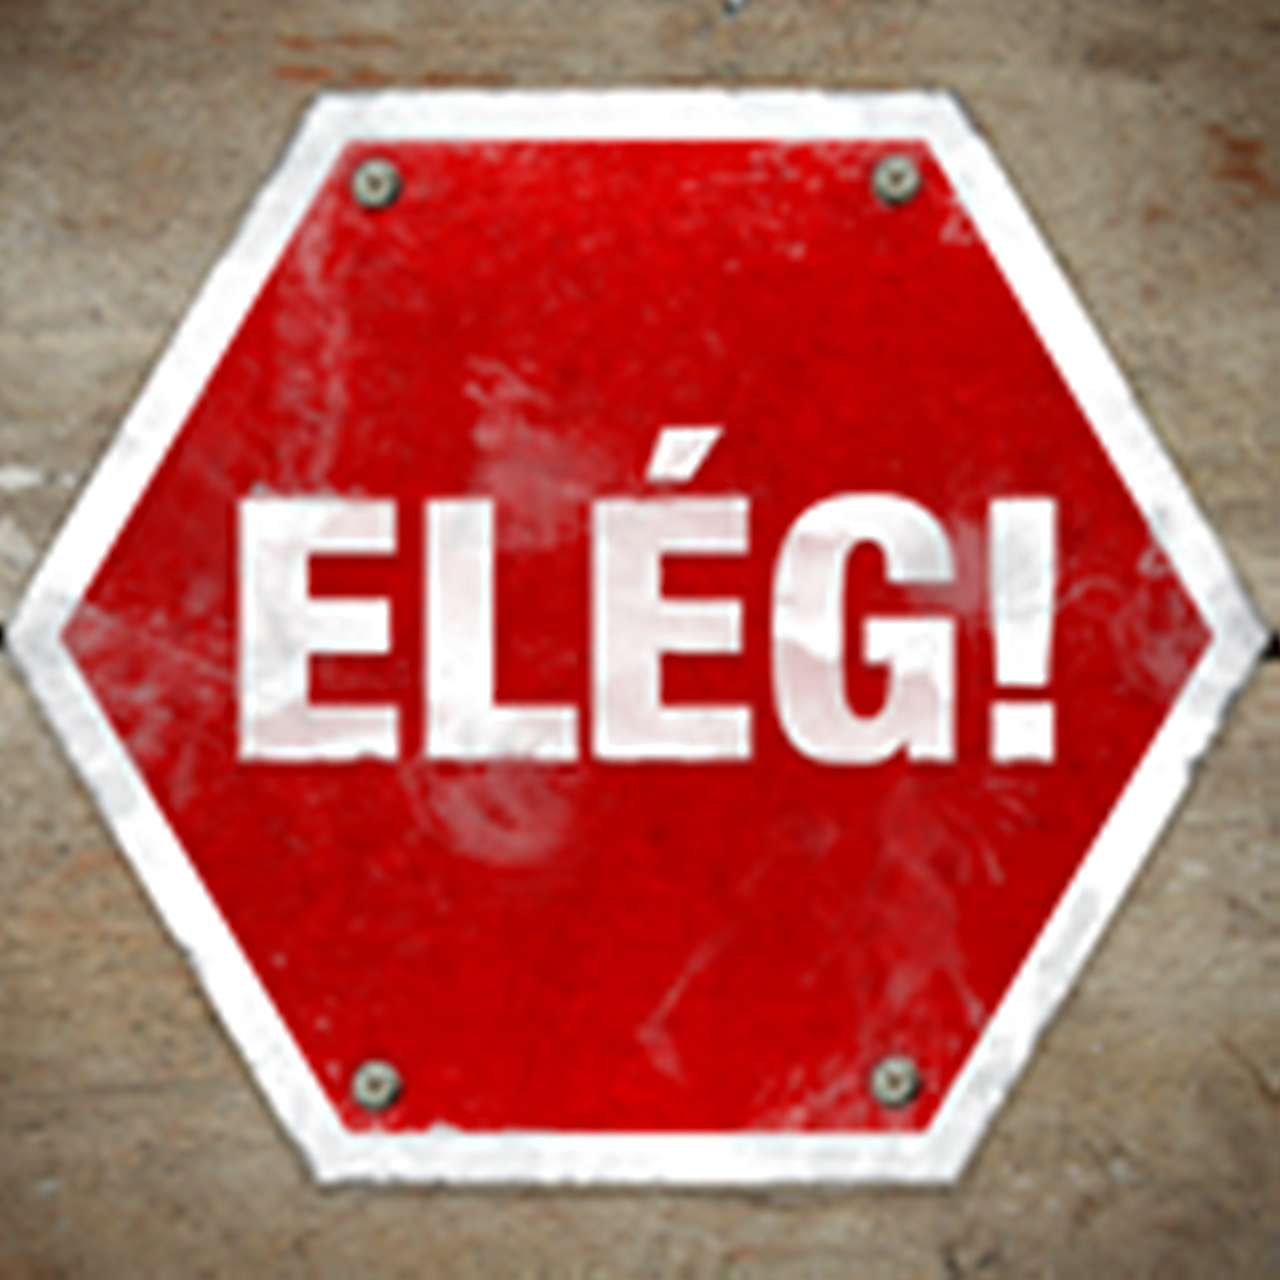 eleg_20jo_20meret.png